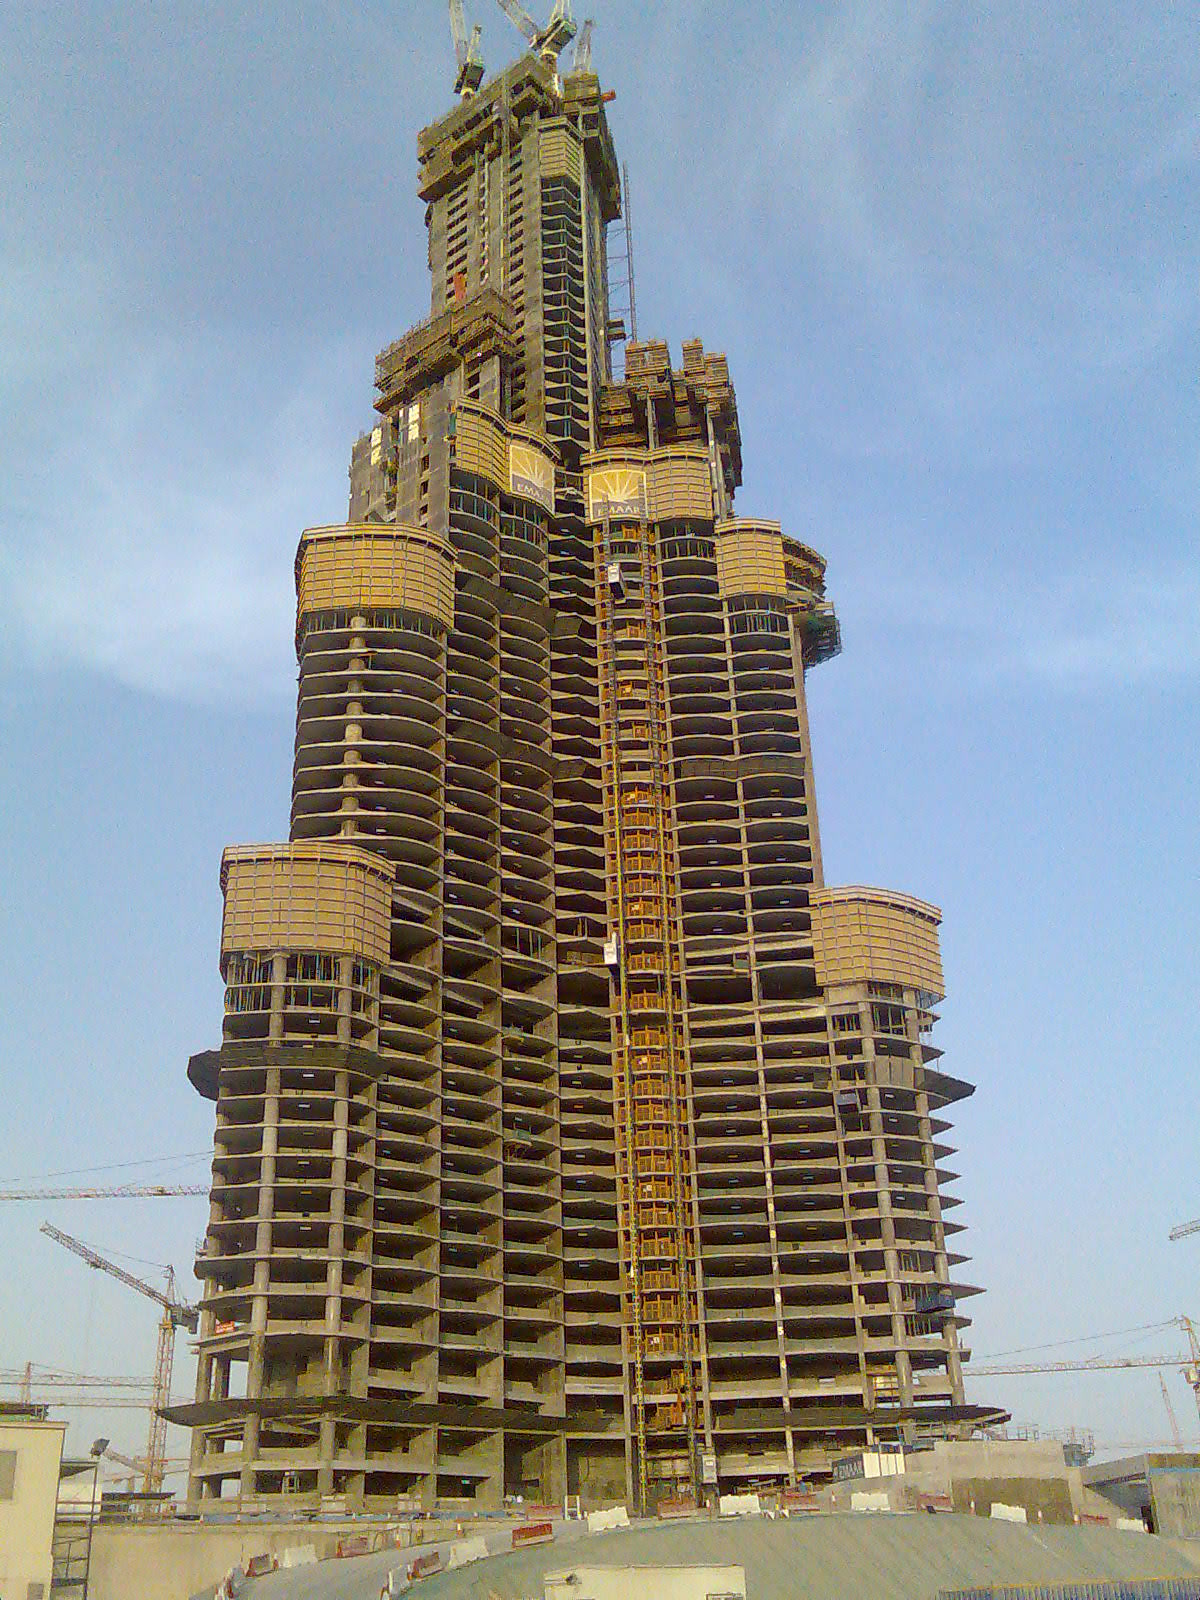 https://upload.wikimedia.org/wikipedia/commons/f/f6/20060829_Burj_Dubai.jpg?uselang=fr